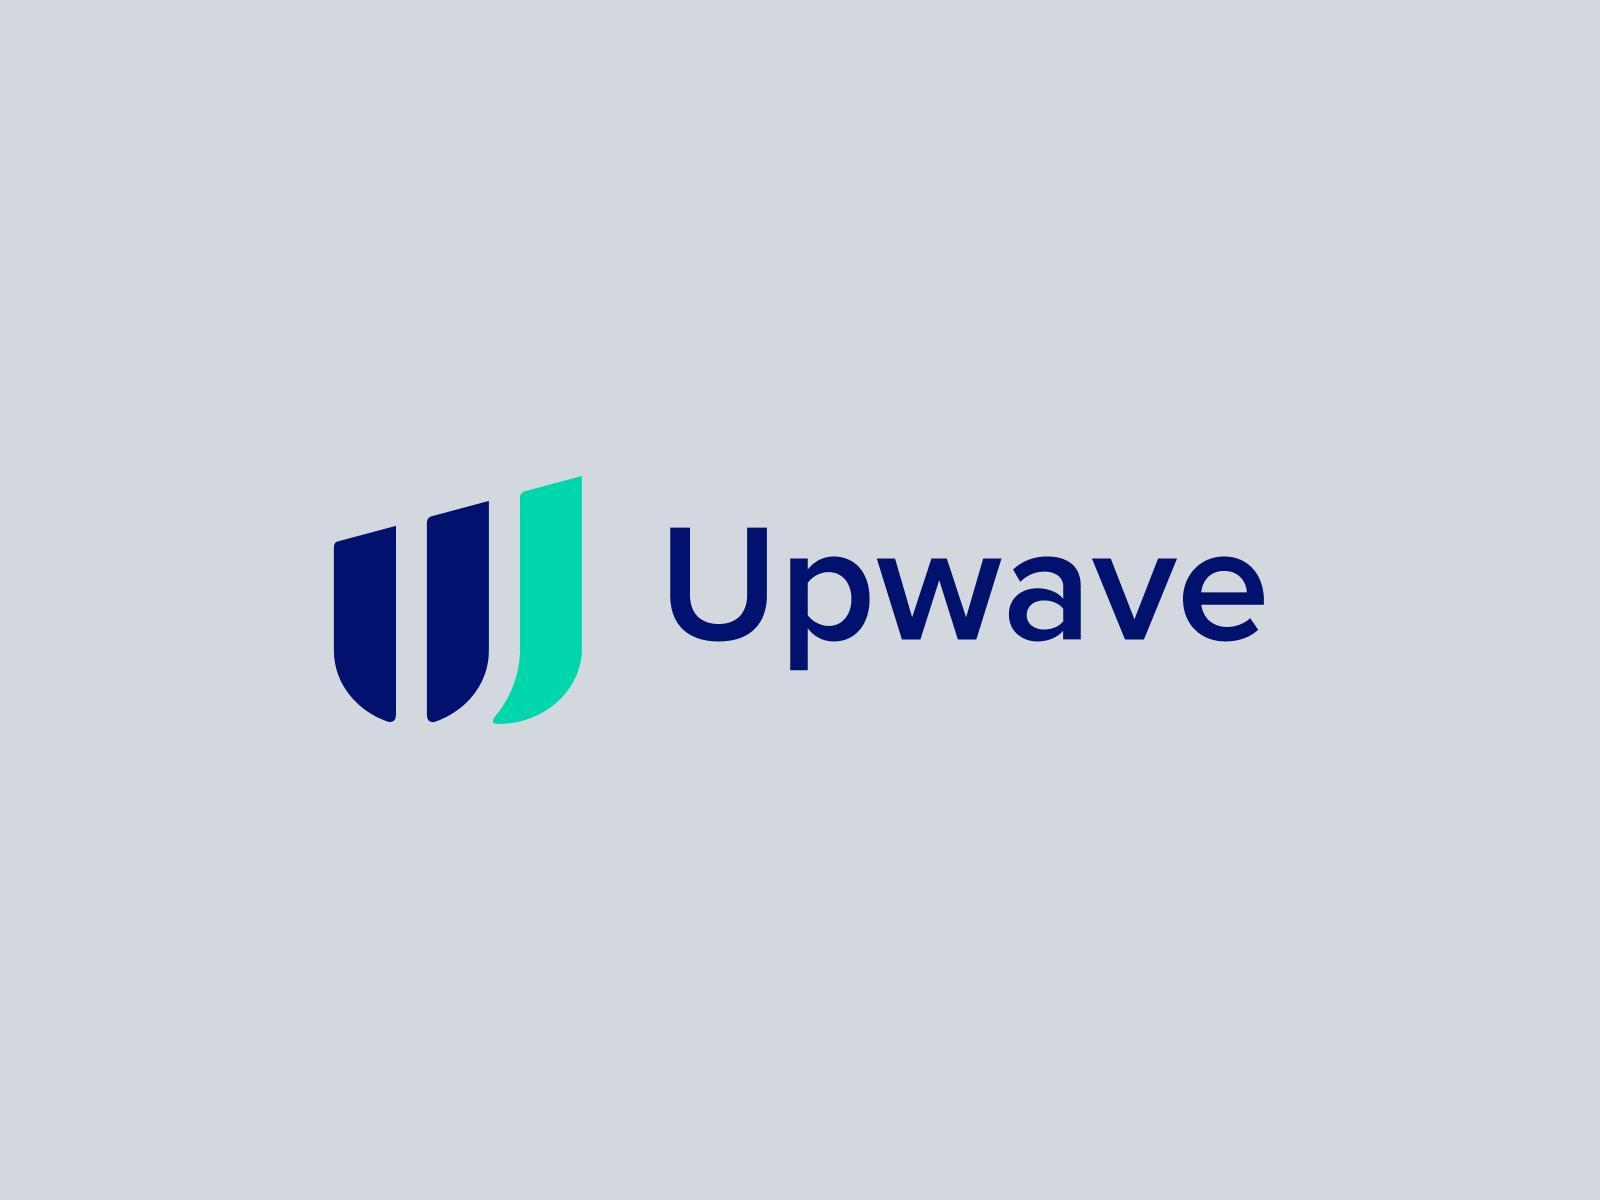 Upwave company logo